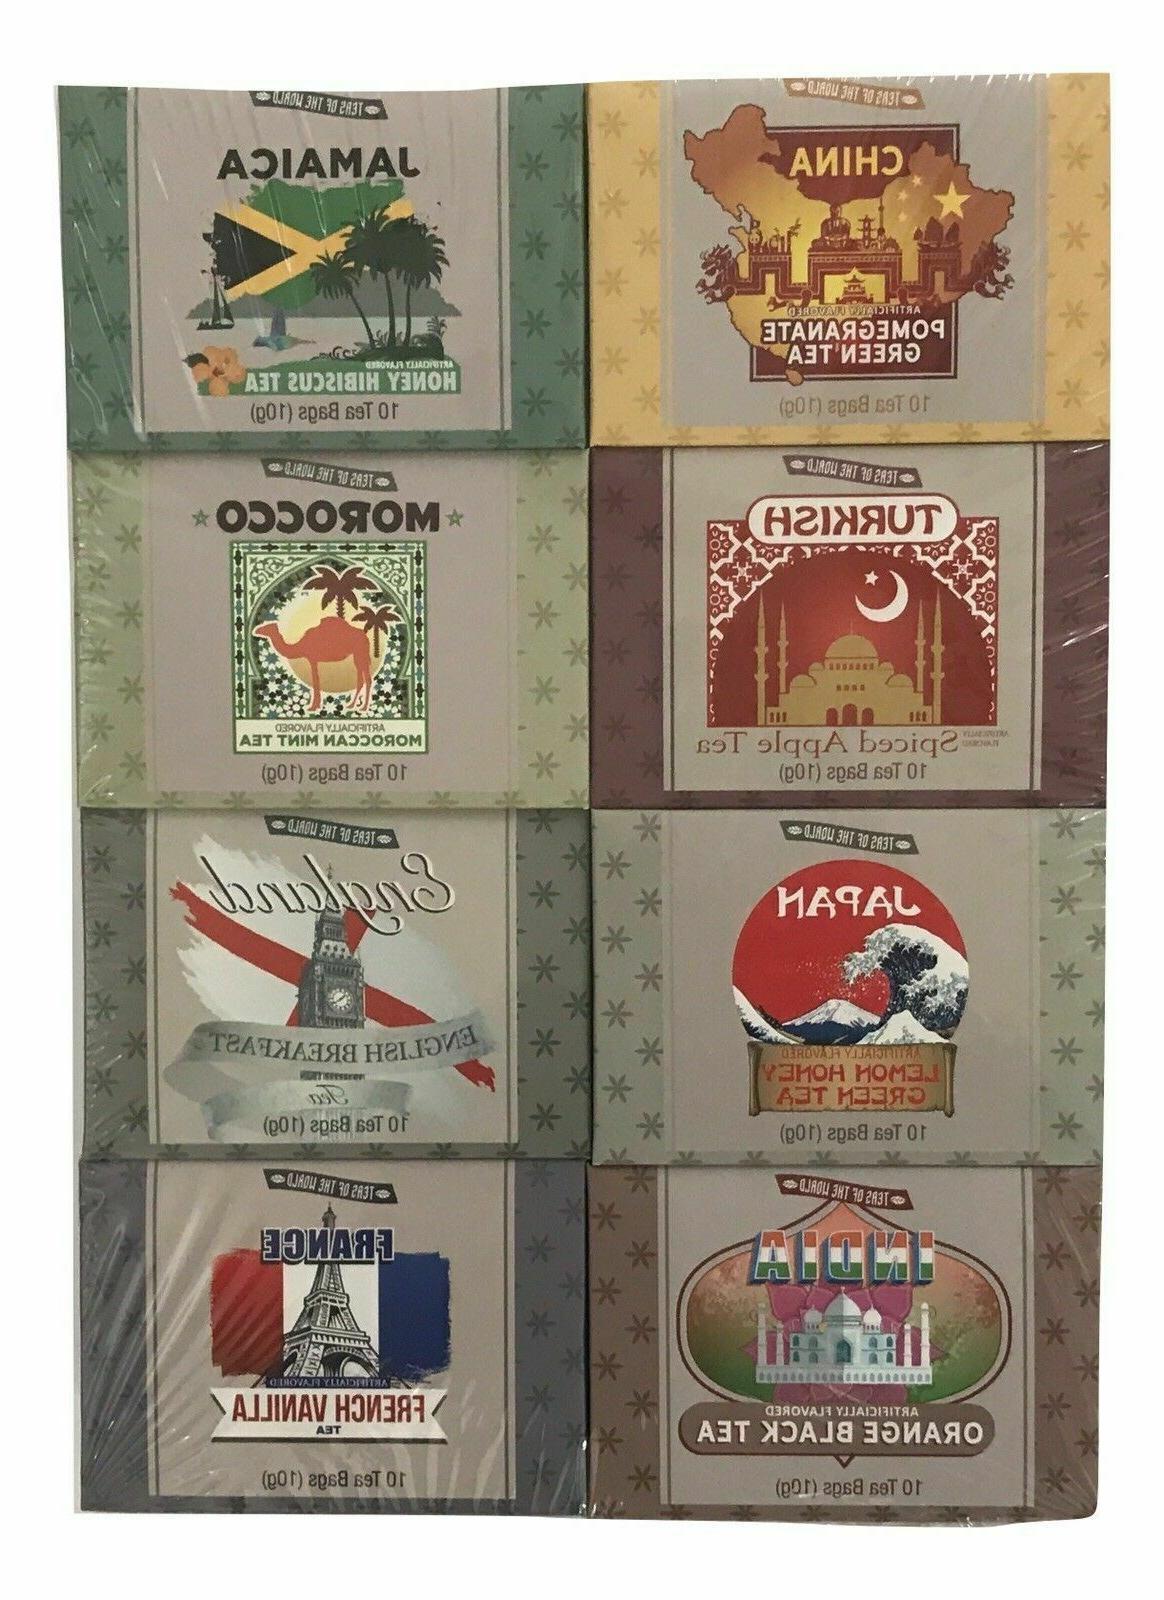 Teas The Tea 80 Gift Set Sampler Total, Flavors